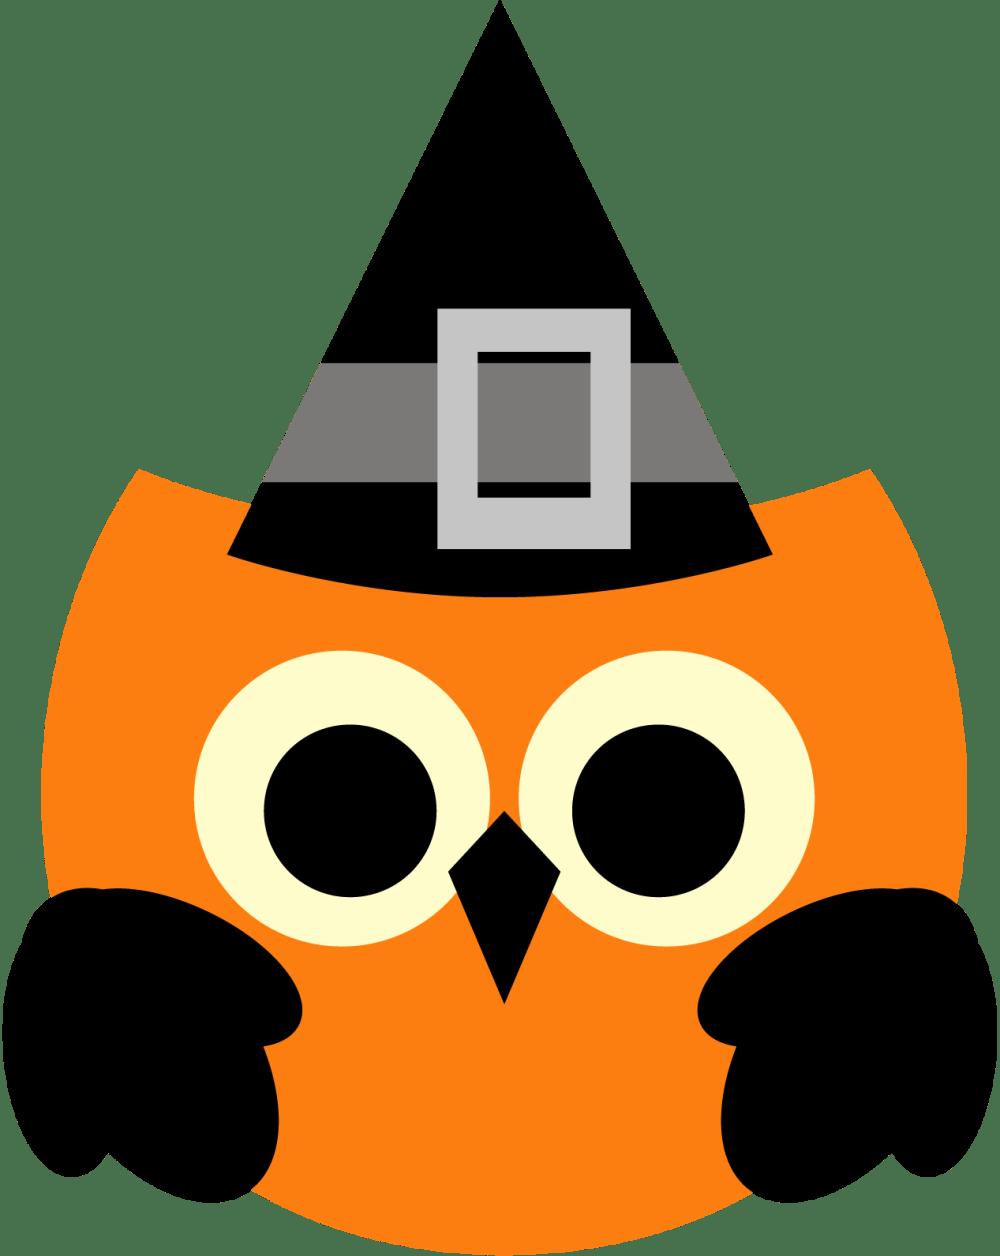 medium resolution of owl halloween clipart freebie free clip art graphic revidevi